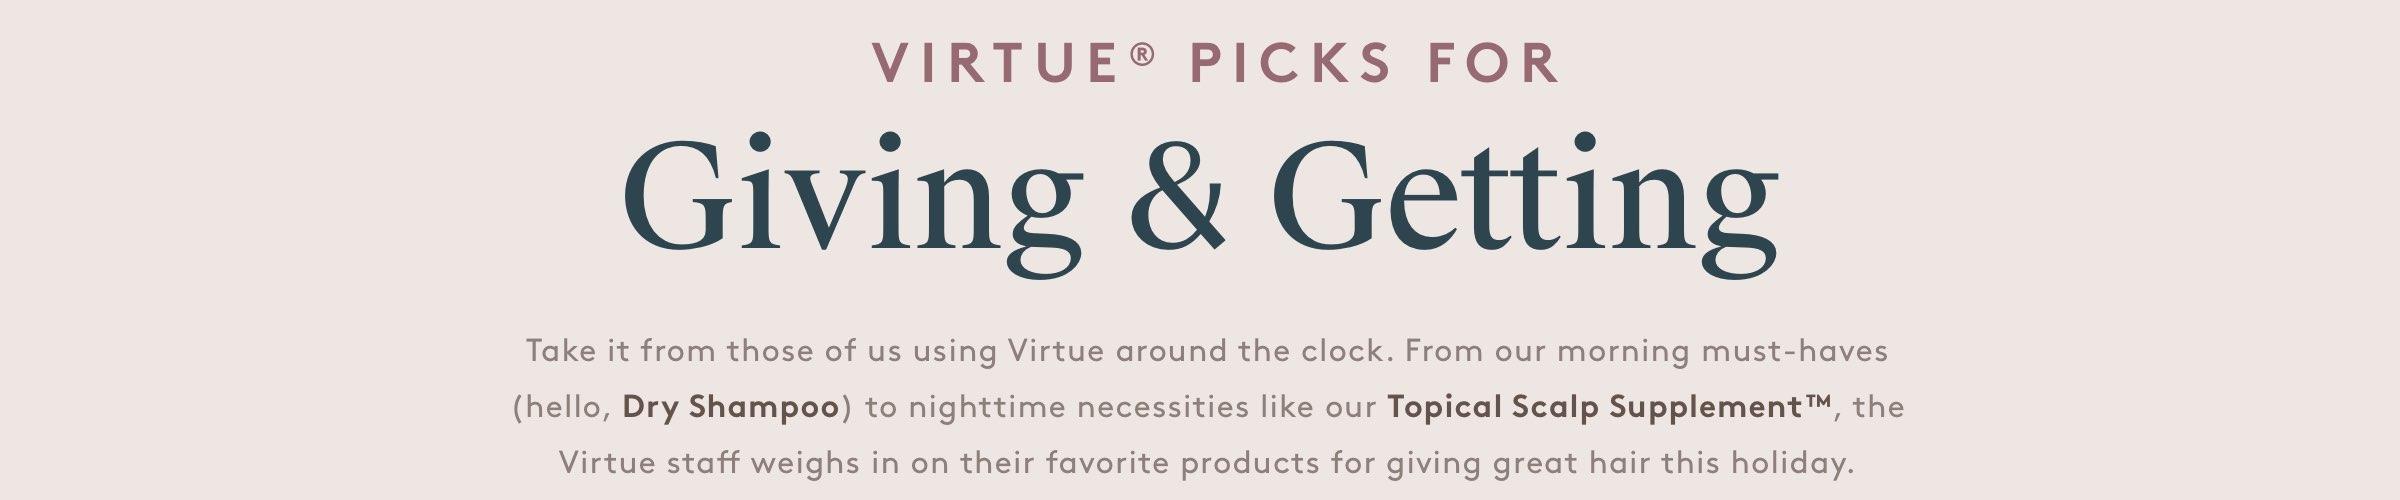 Virtue Picks For Giving & Getting